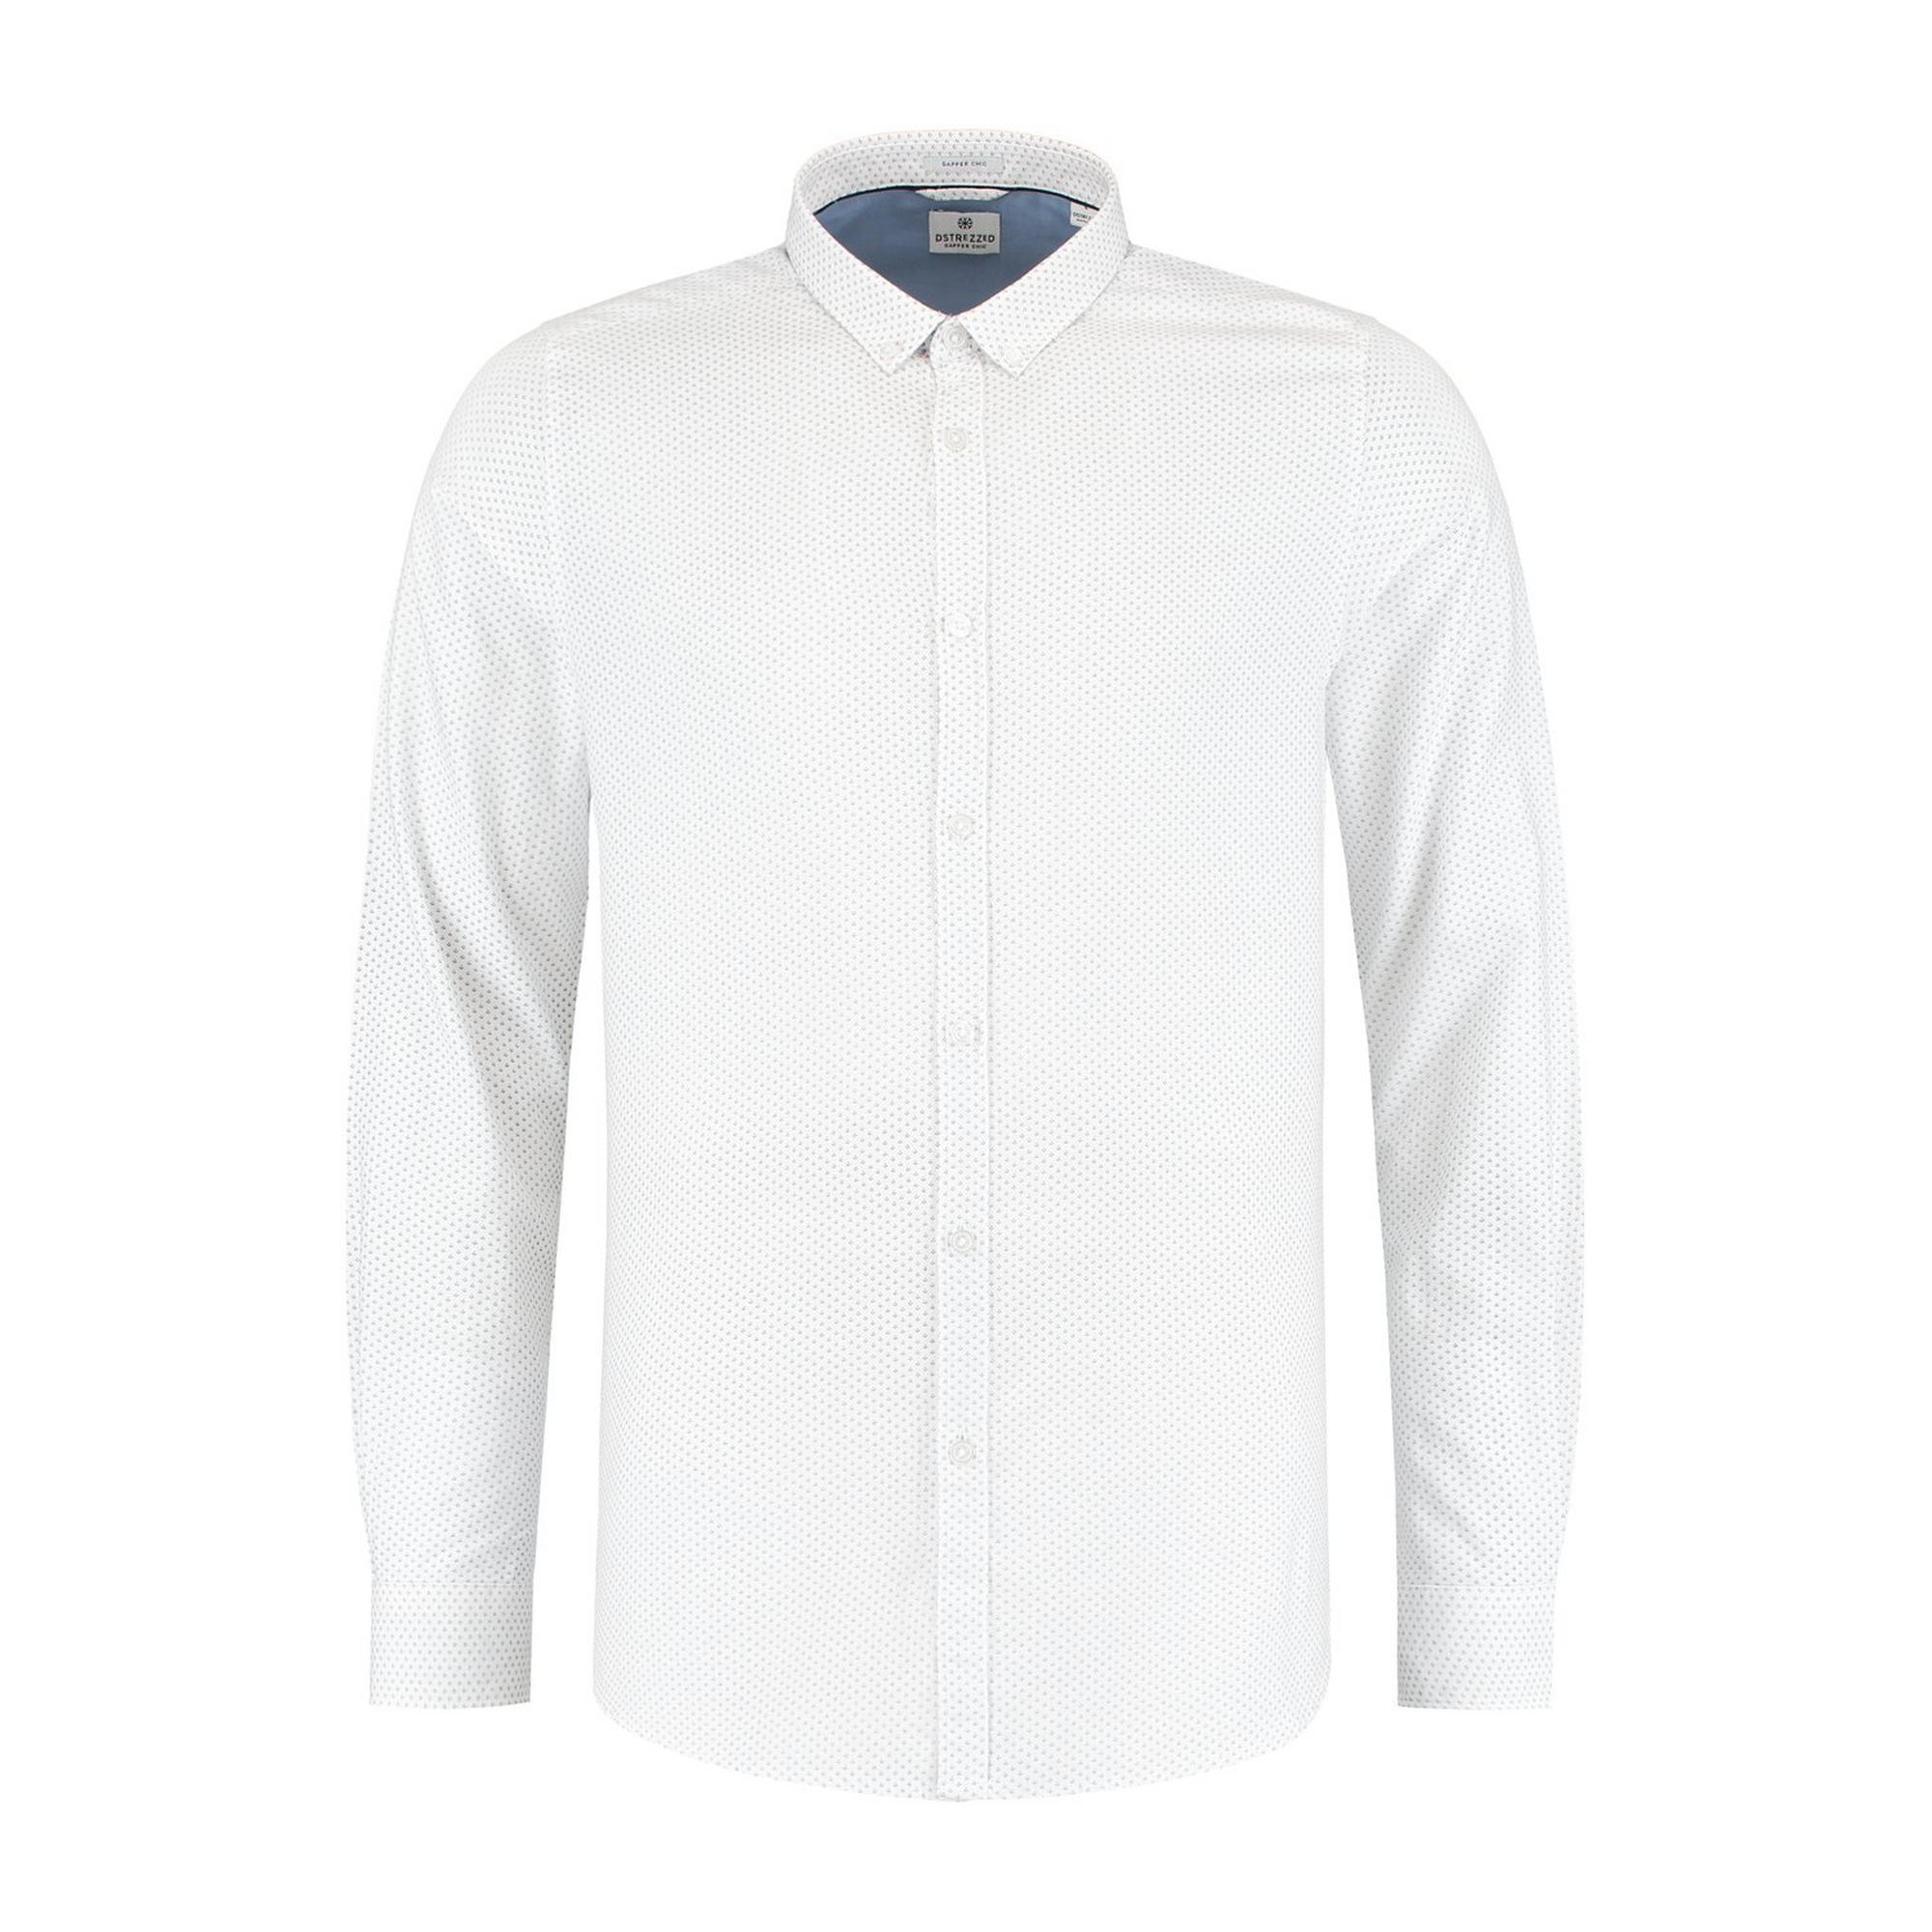 Men's Small Dot Fine Jacquard Woven Long Sleeve Shirt